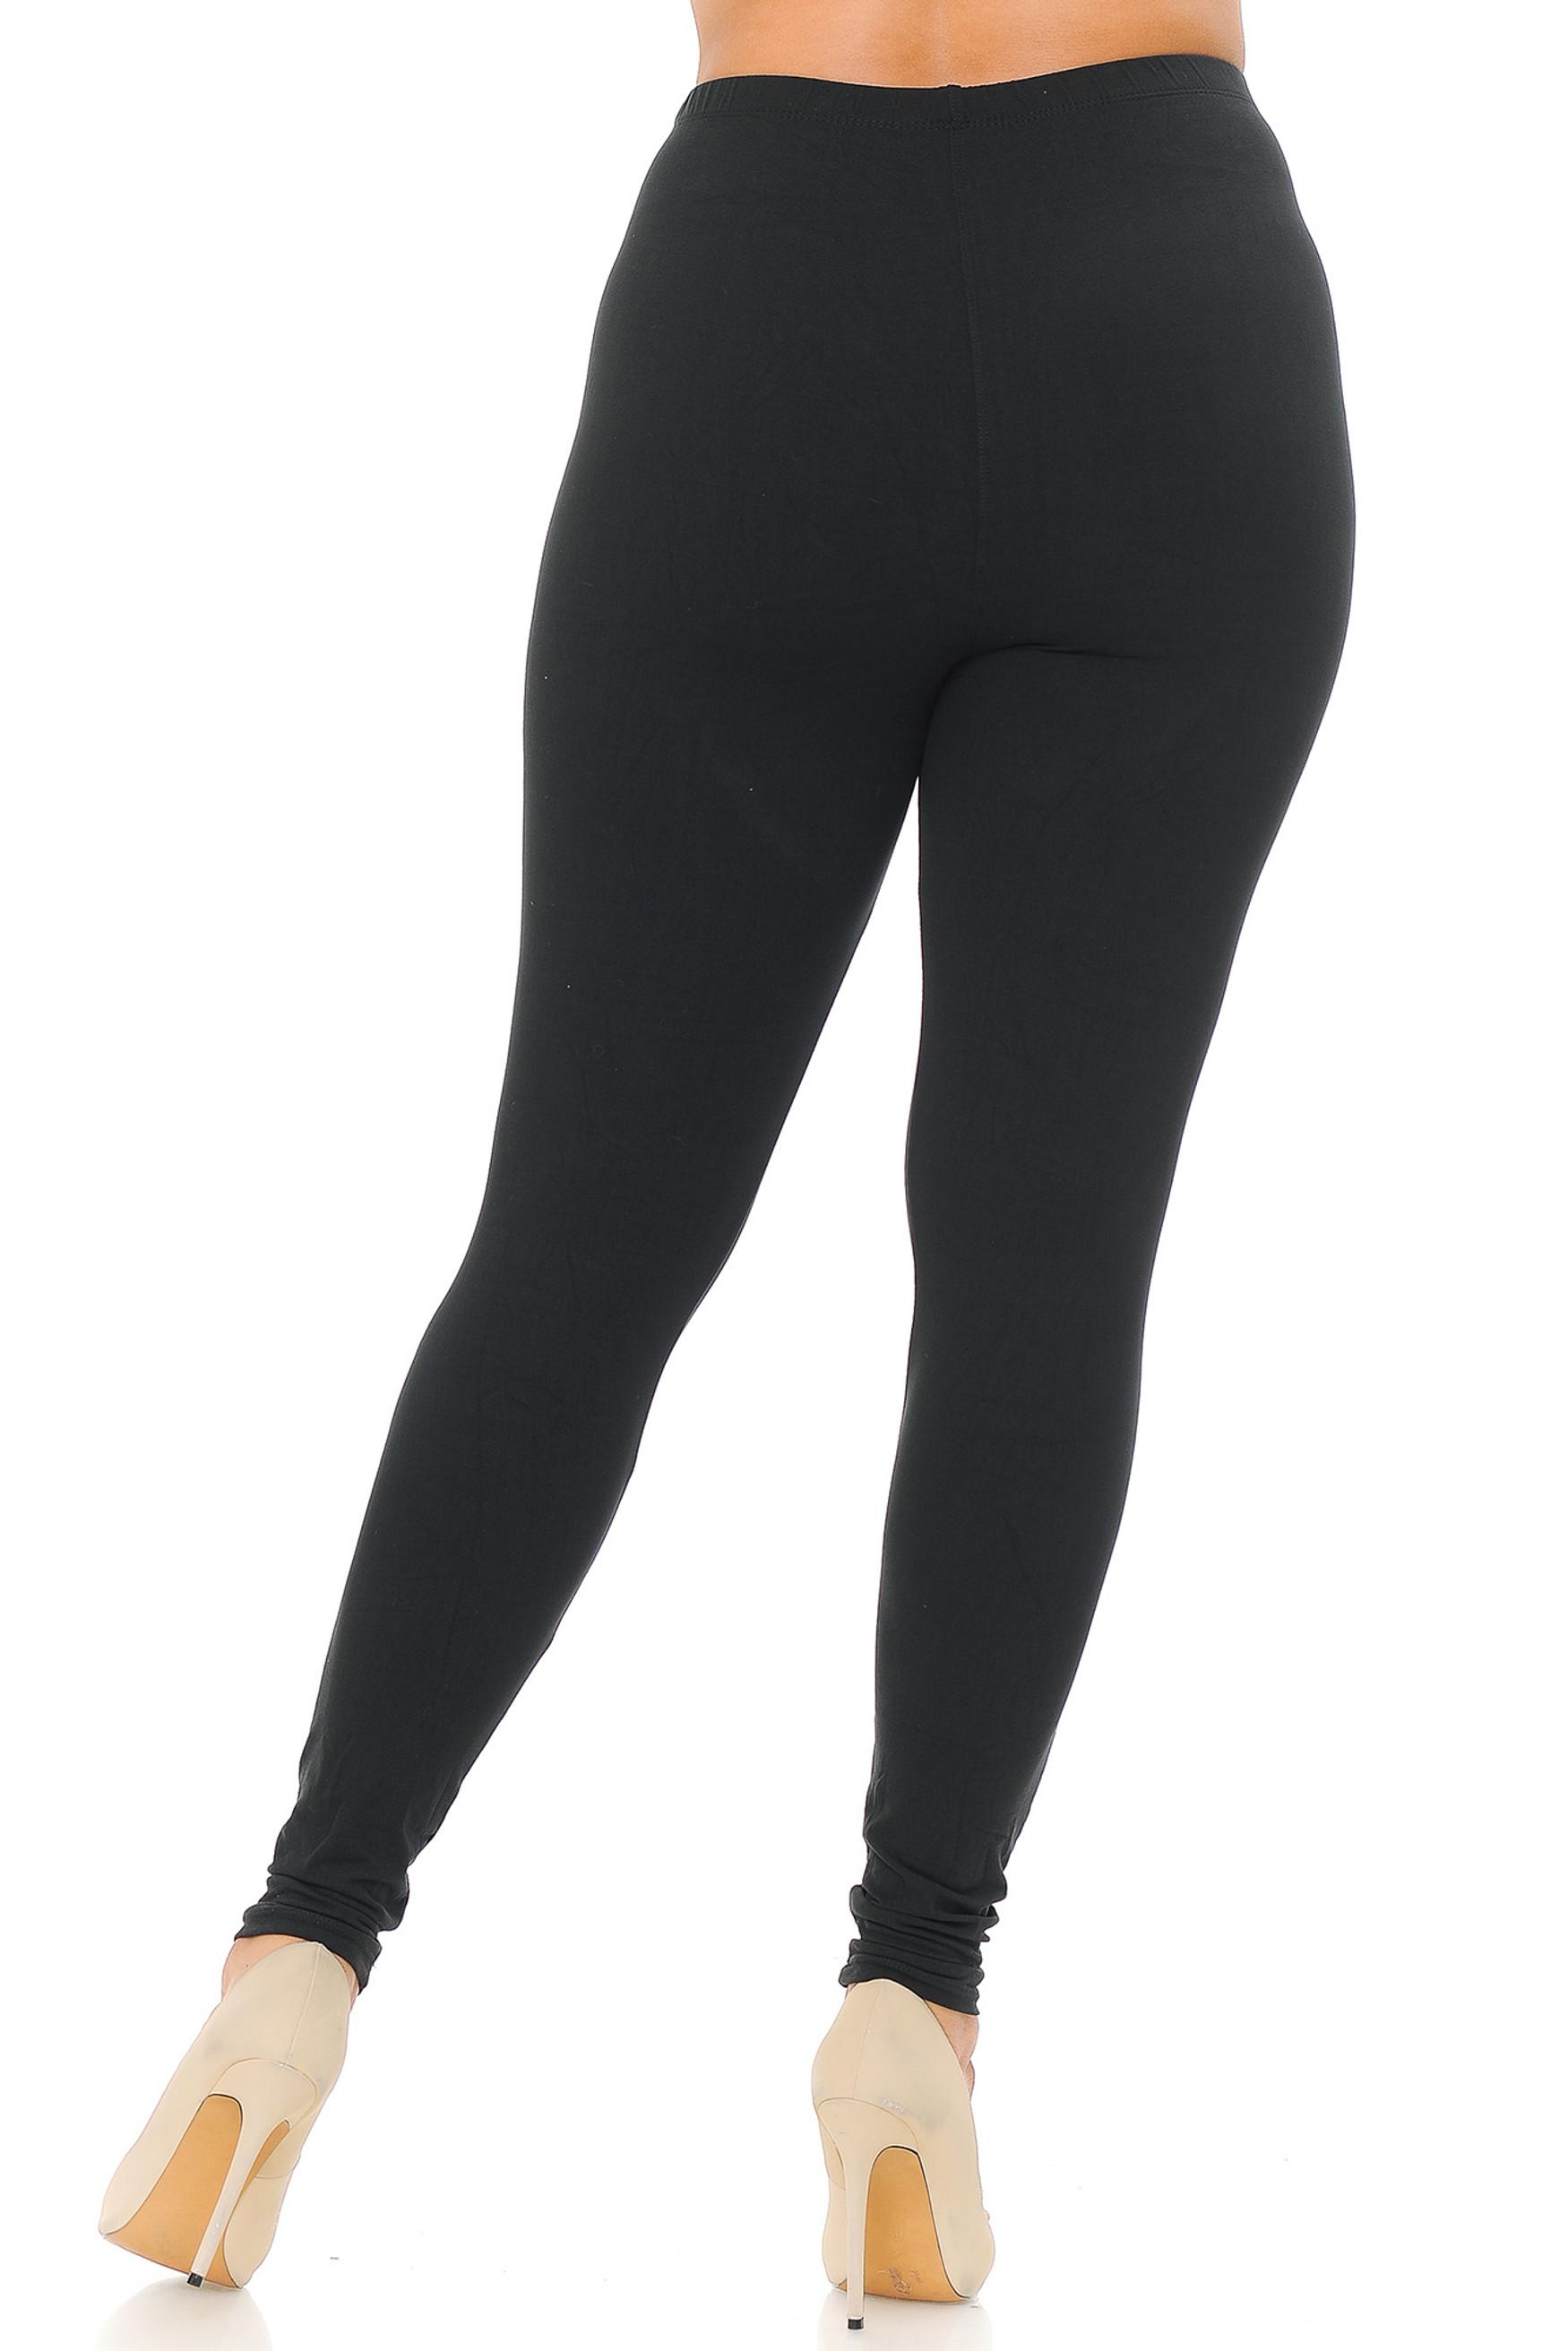 Black Back Brushed Basic Solid Plus Size Leggings - EEVEE